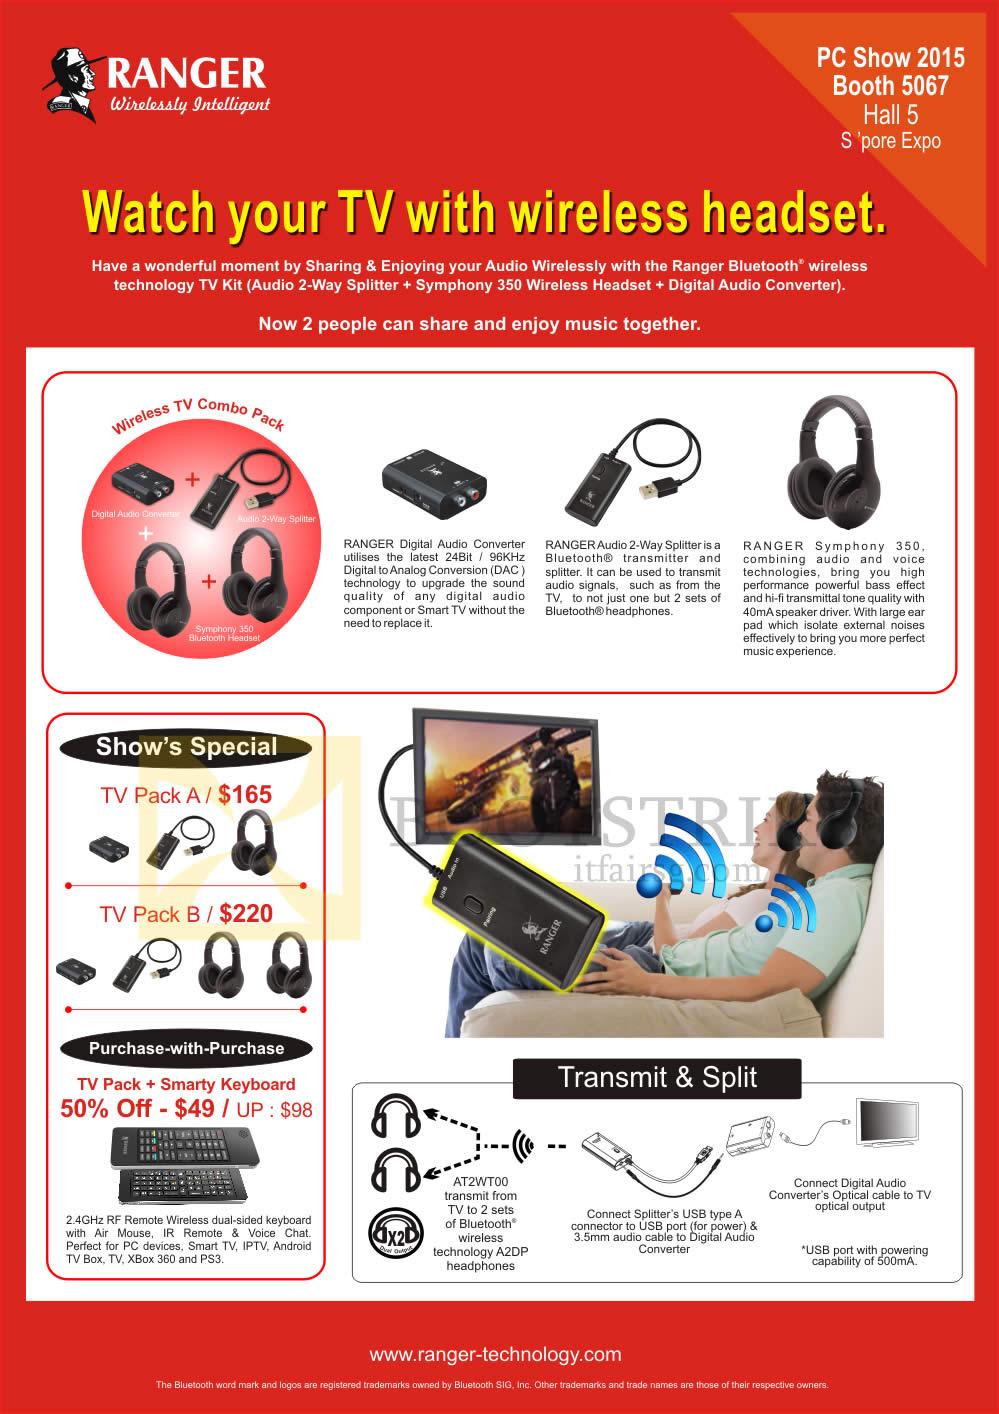 PC SHOW 2015 price list image brochure of Ranger Wireless TV Packs